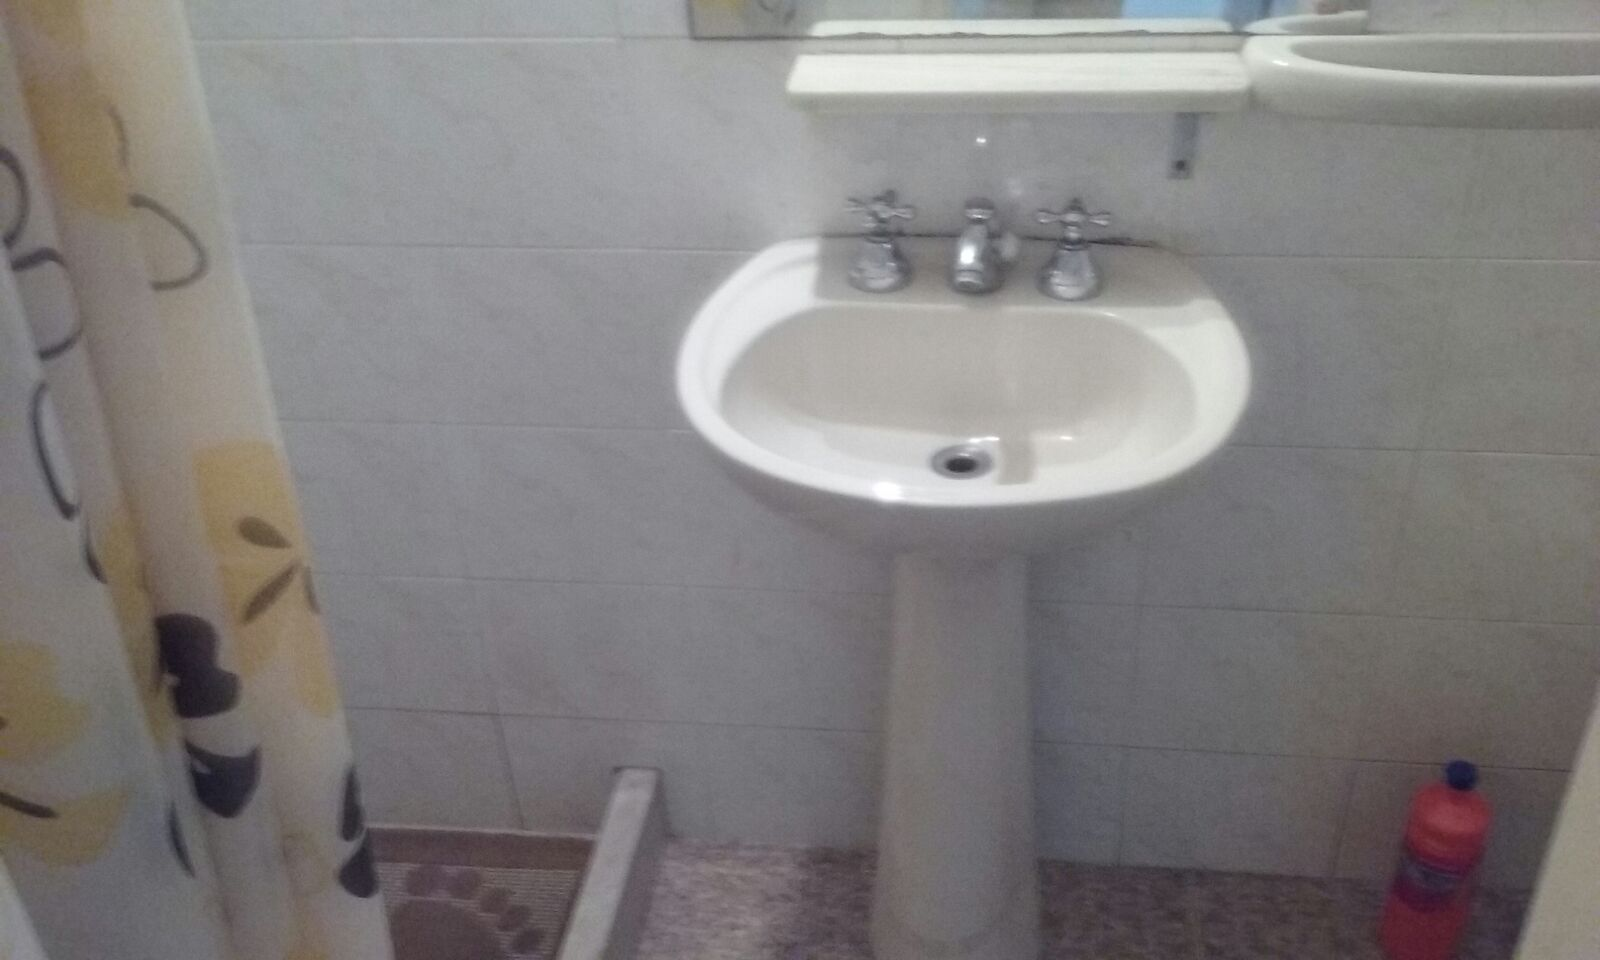 Alquiler Monoambiente Con Muebles Pocitos Ref E8cd9 Infocasas  # Muebles Pocitos